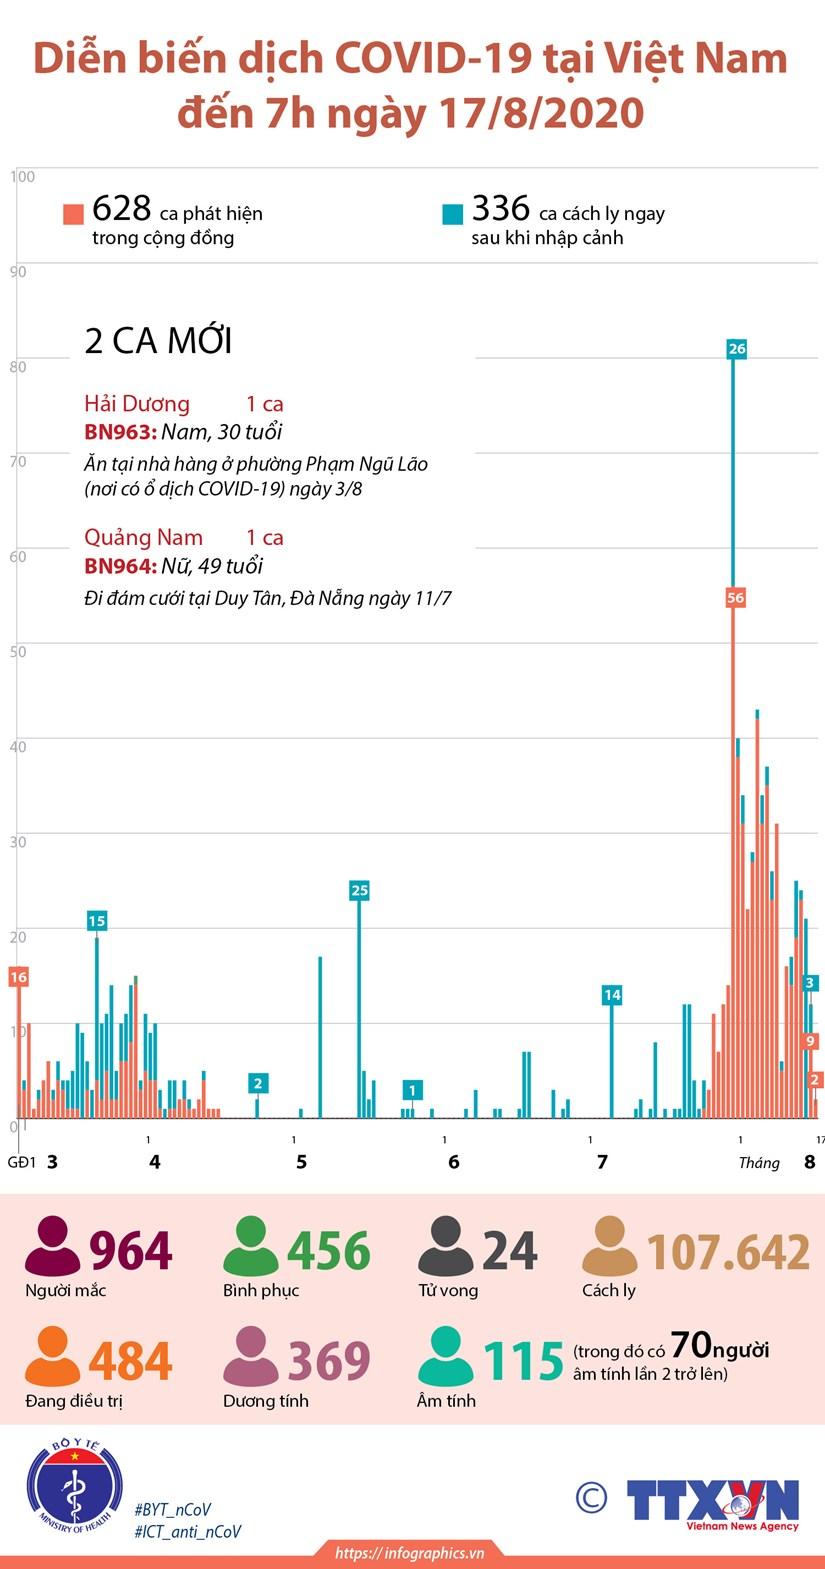 [Infographics] Viet Nam da co 964 truong hop mac COVID-19 hinh anh 1